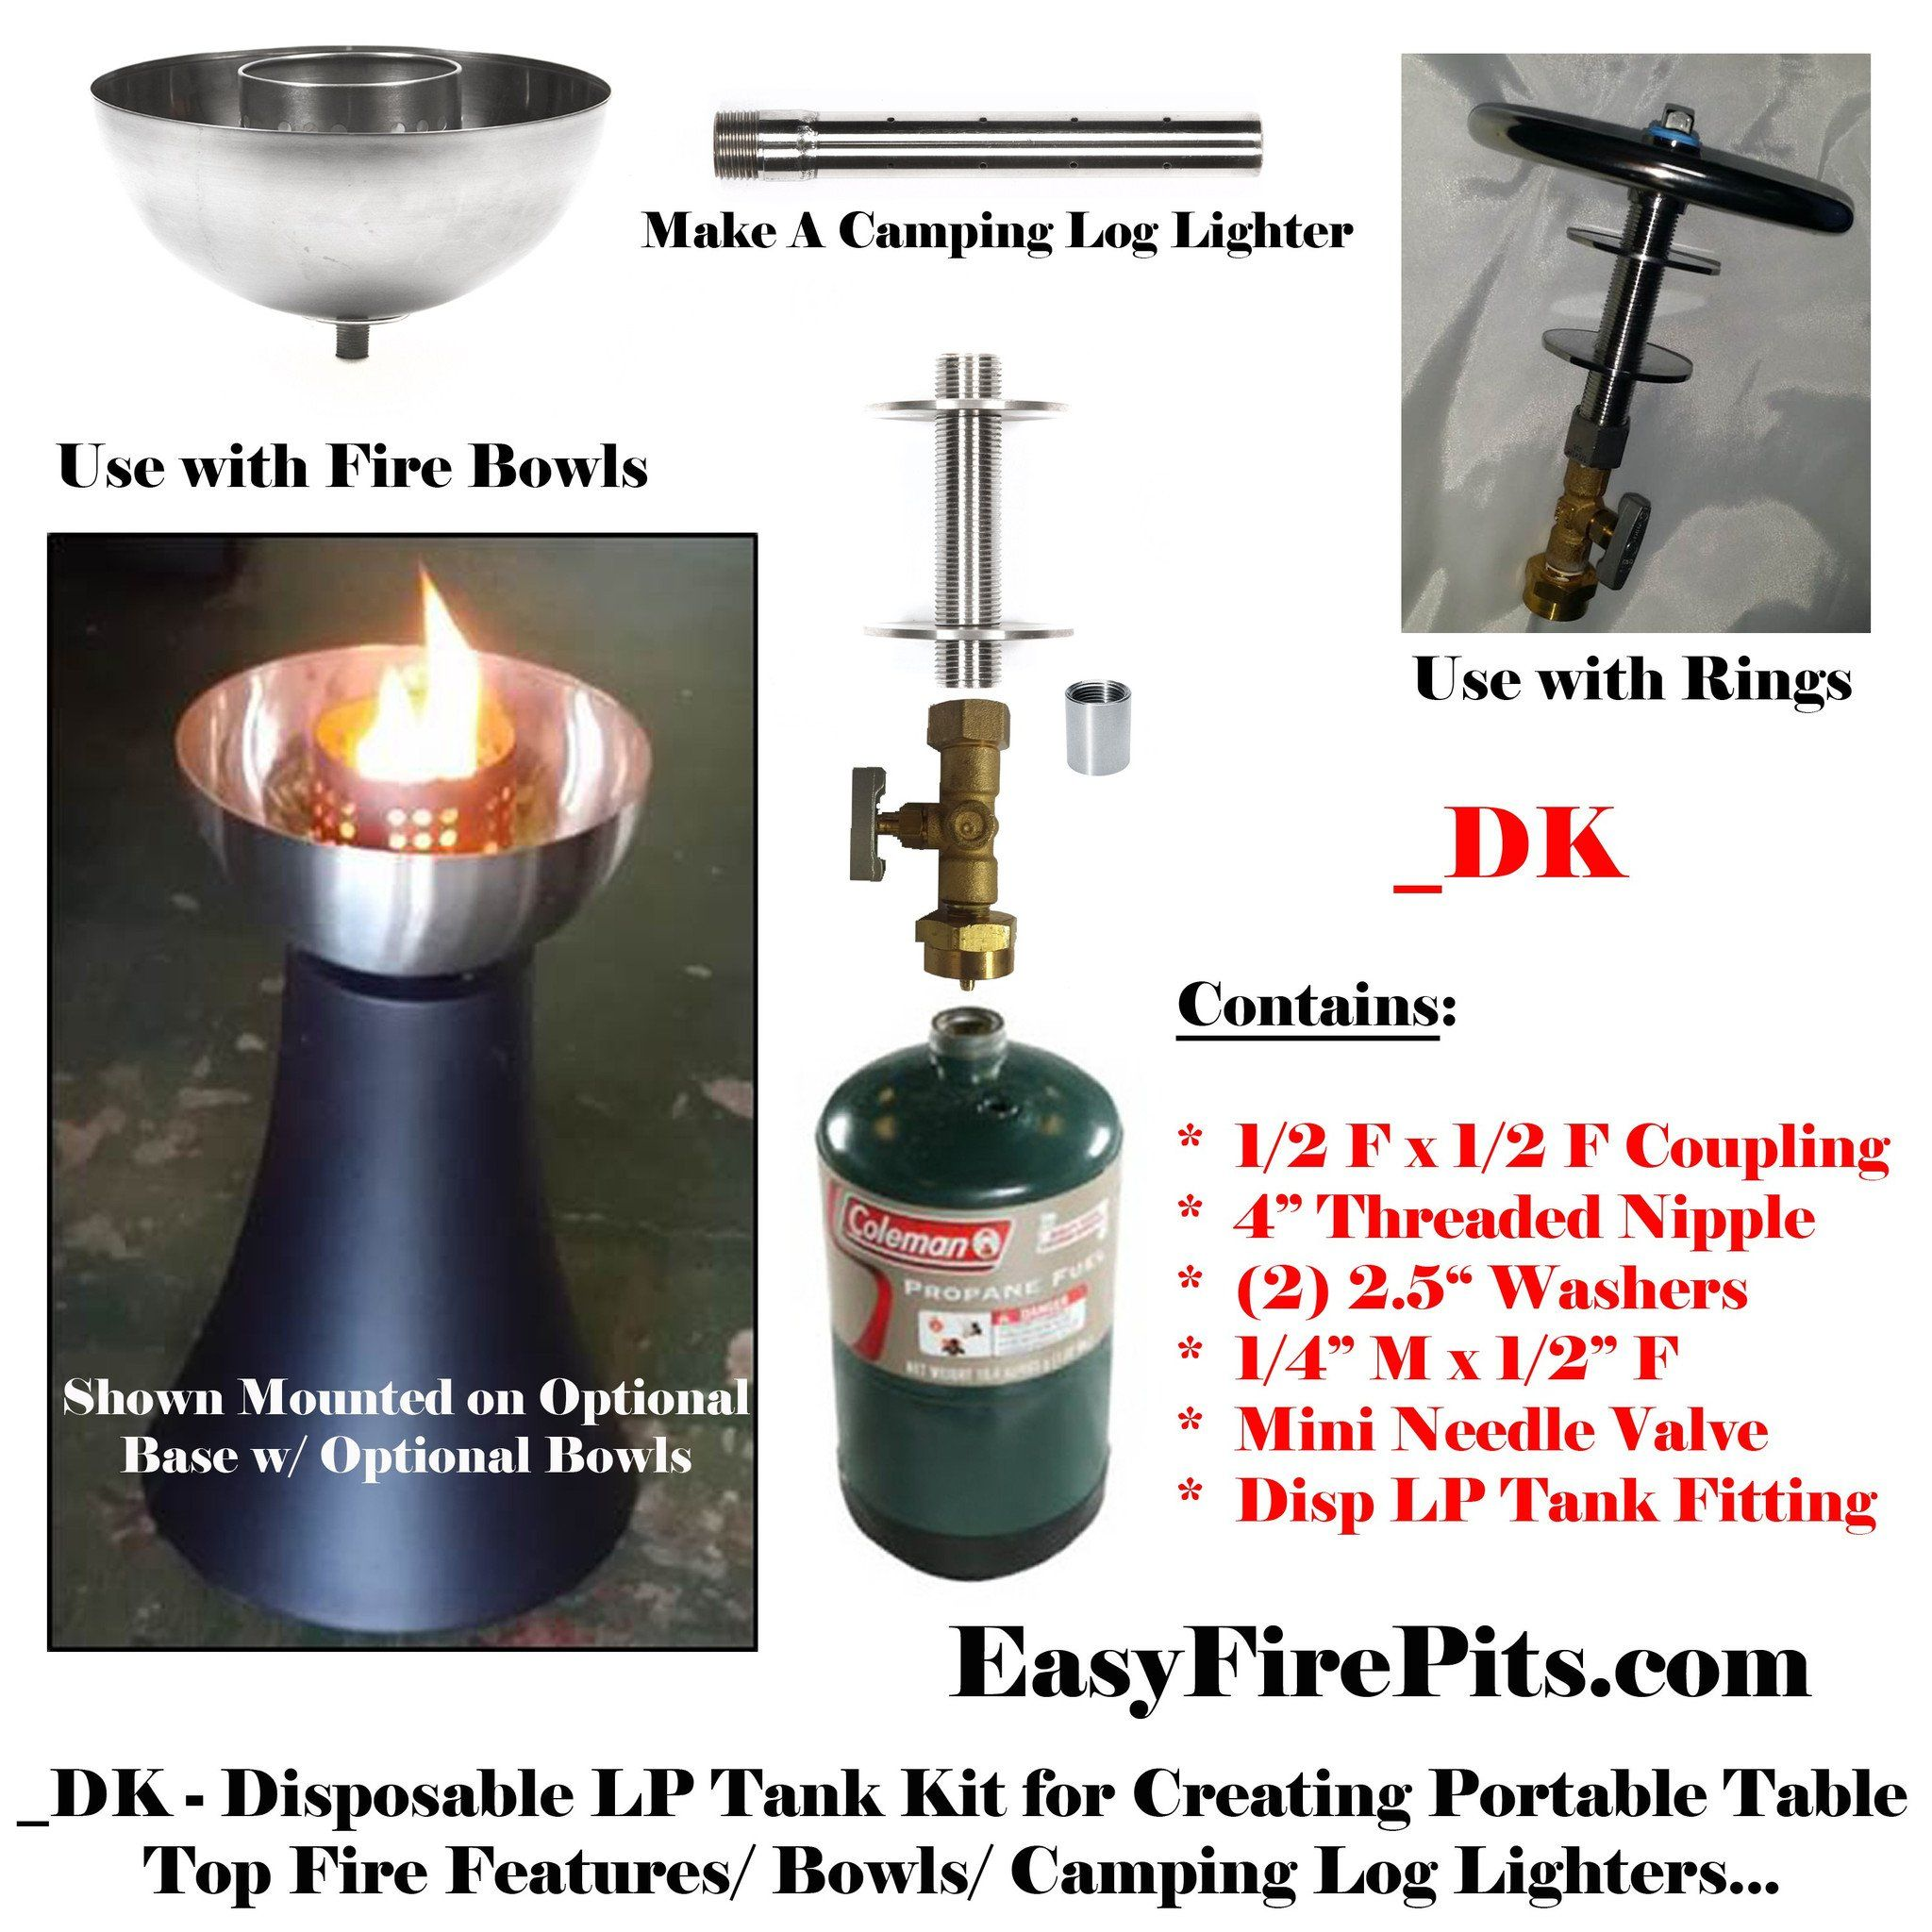 dk universal adjustable disposable lp propane tank kit for diy fire